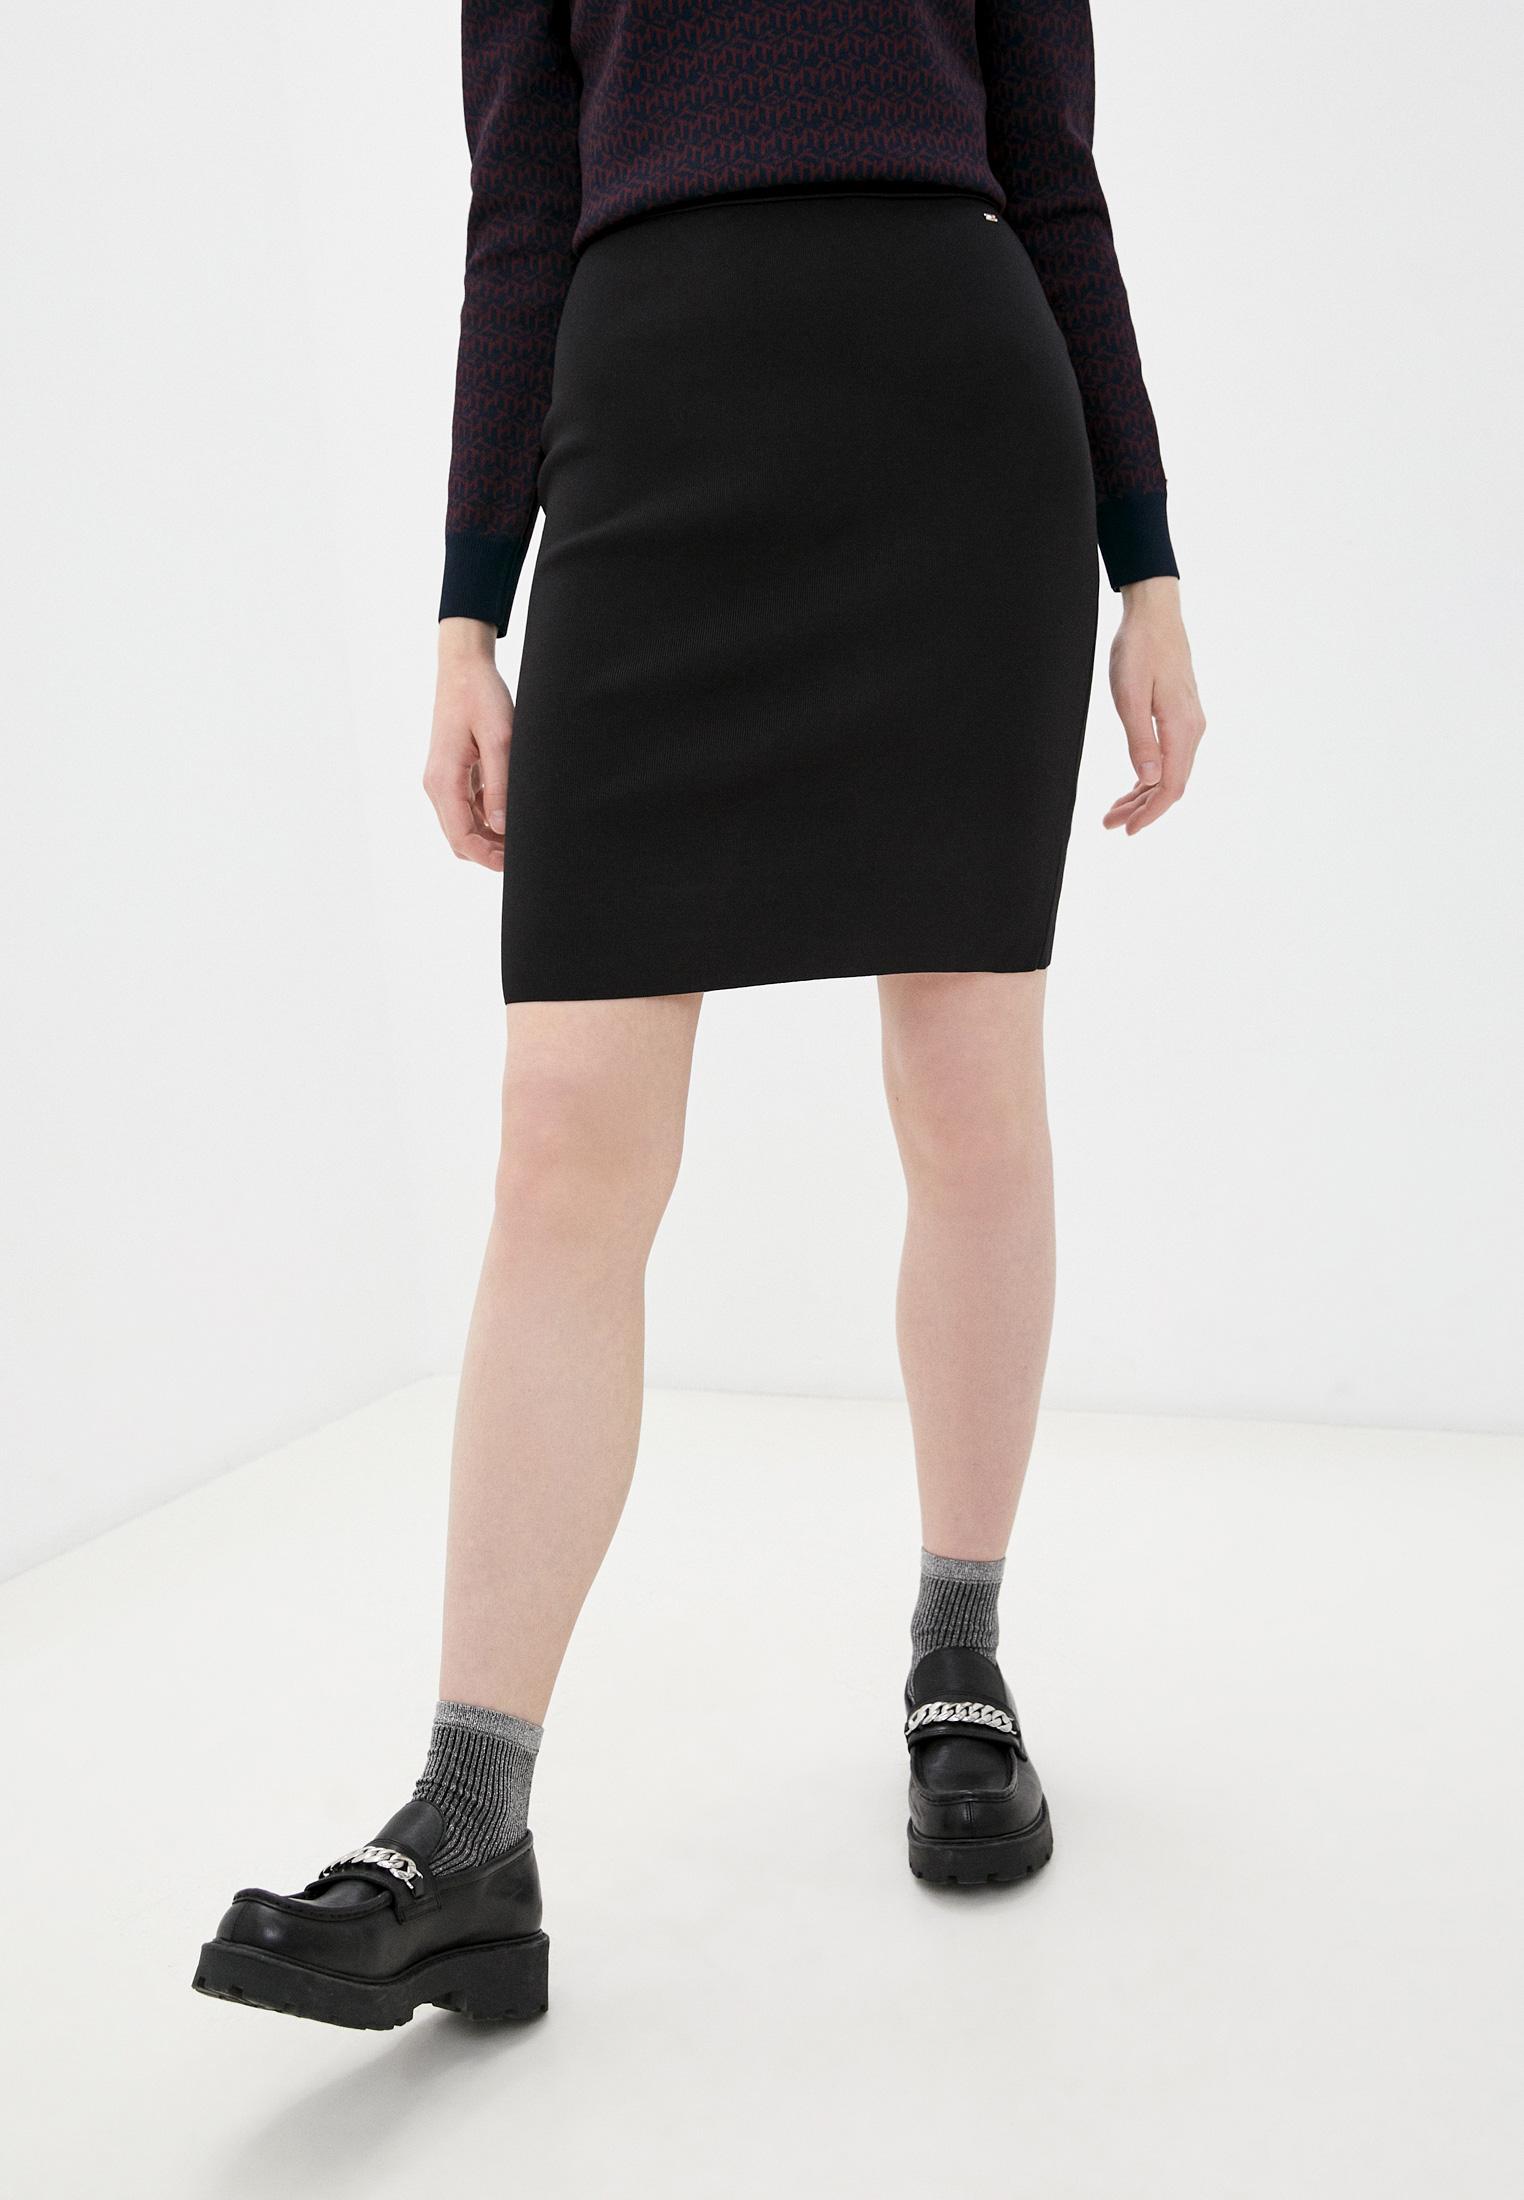 Узкая юбка Tommy Hilfiger (Томми Хилфигер) Юбка Tommy Hilfiger